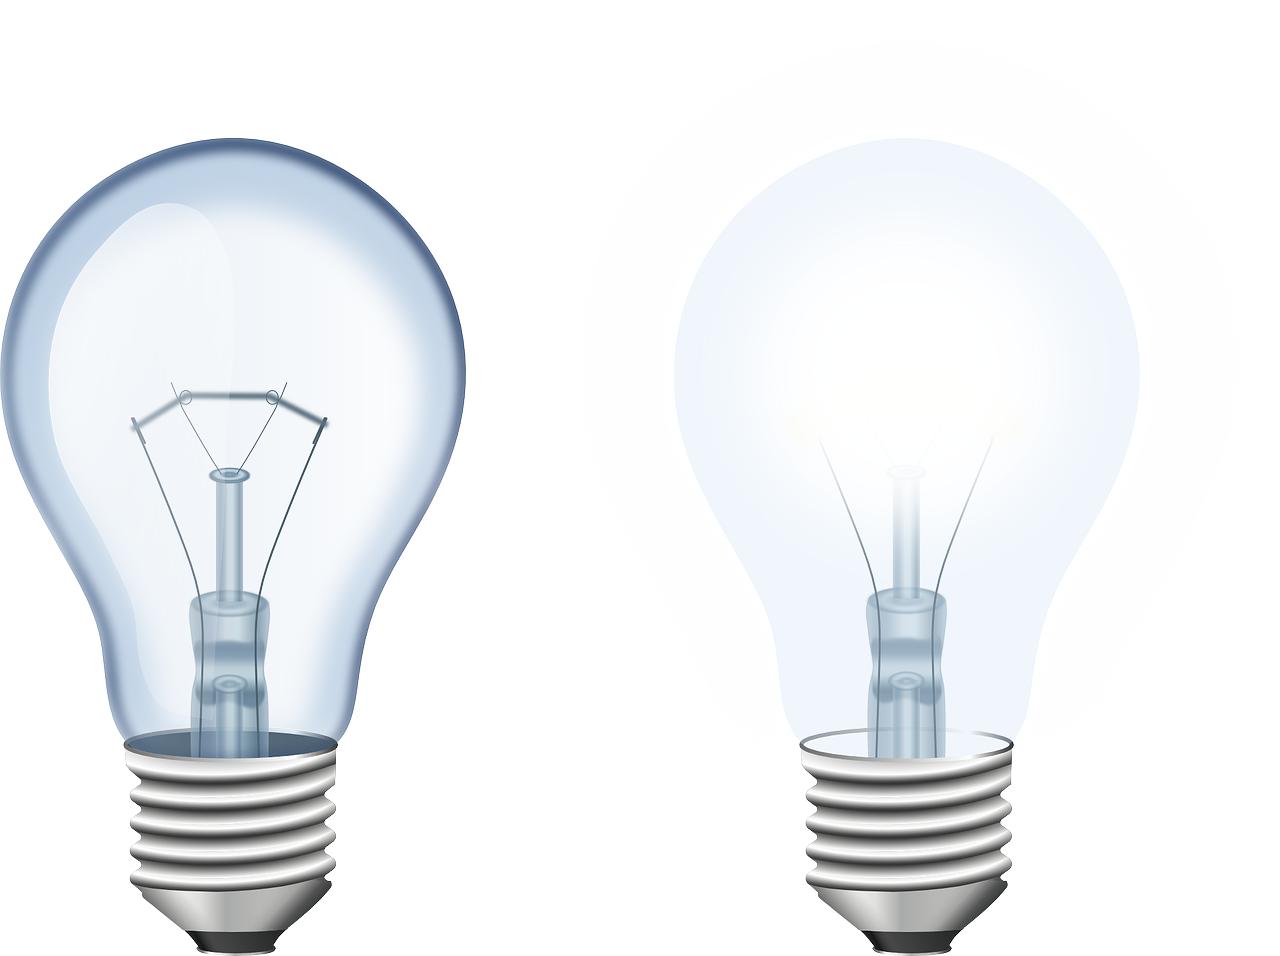 2 lightbulbs